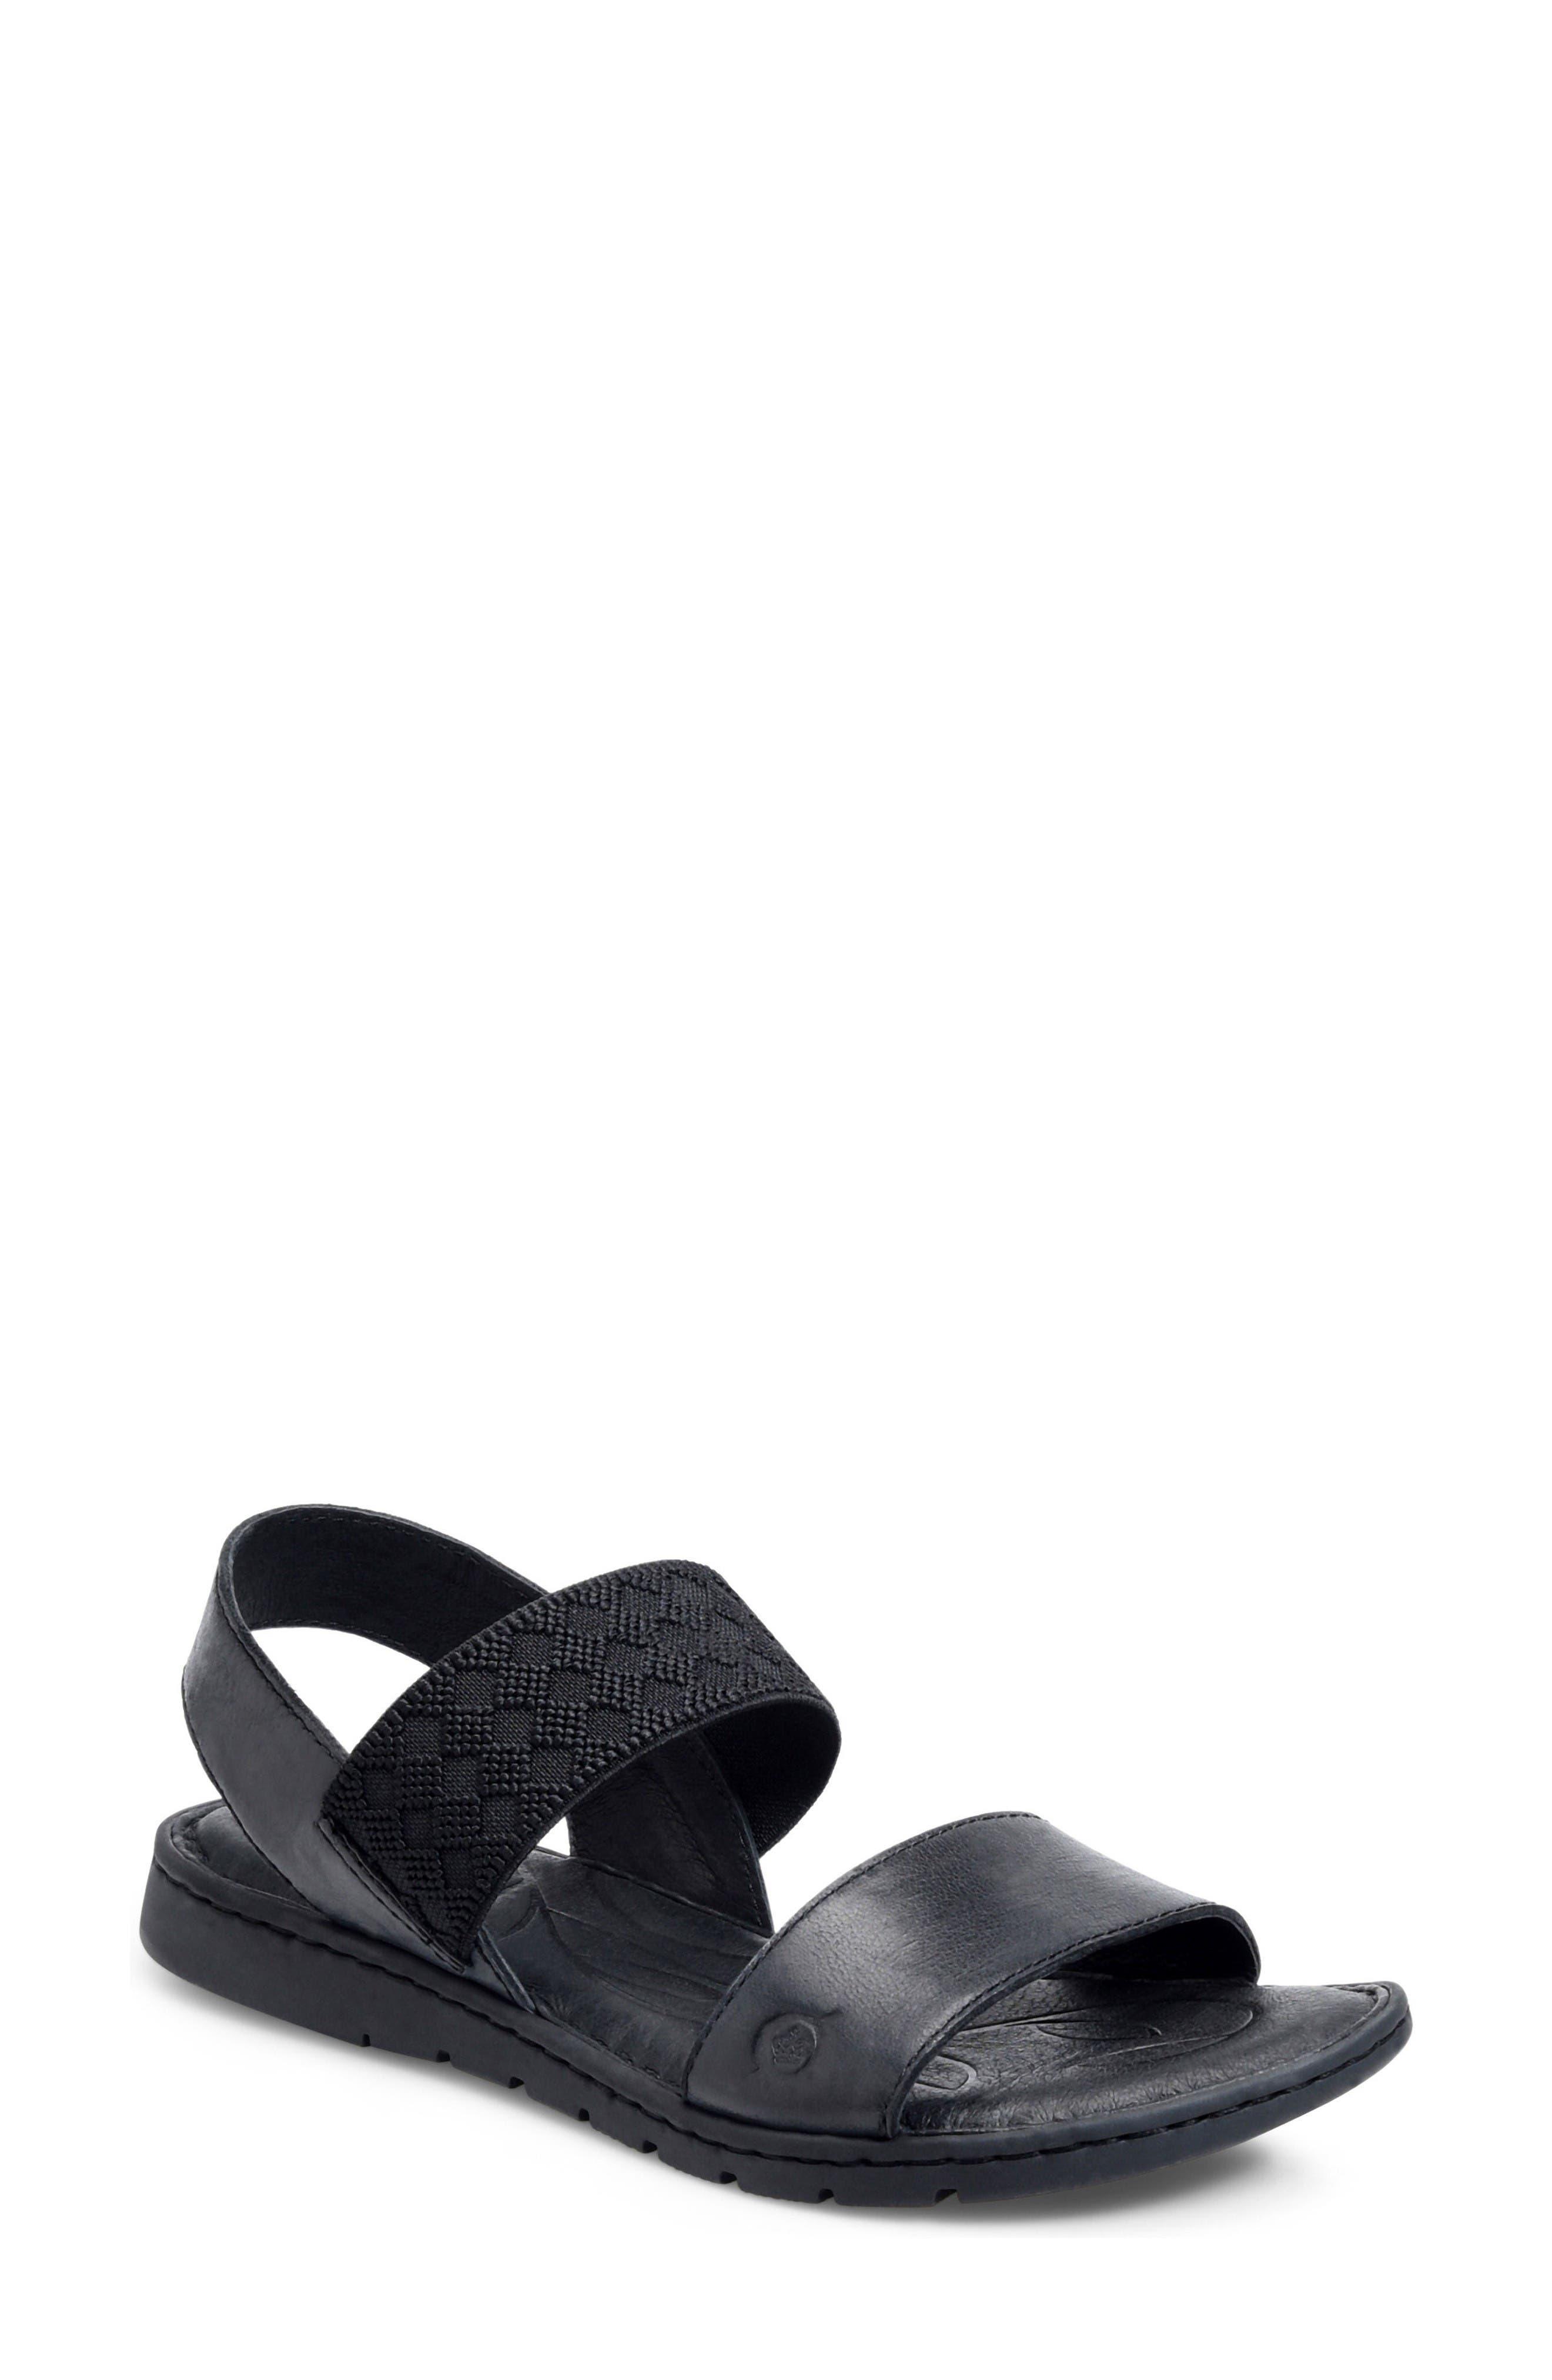 Parsons Sandal,                         Main,                         color, Black Full Grain Leather